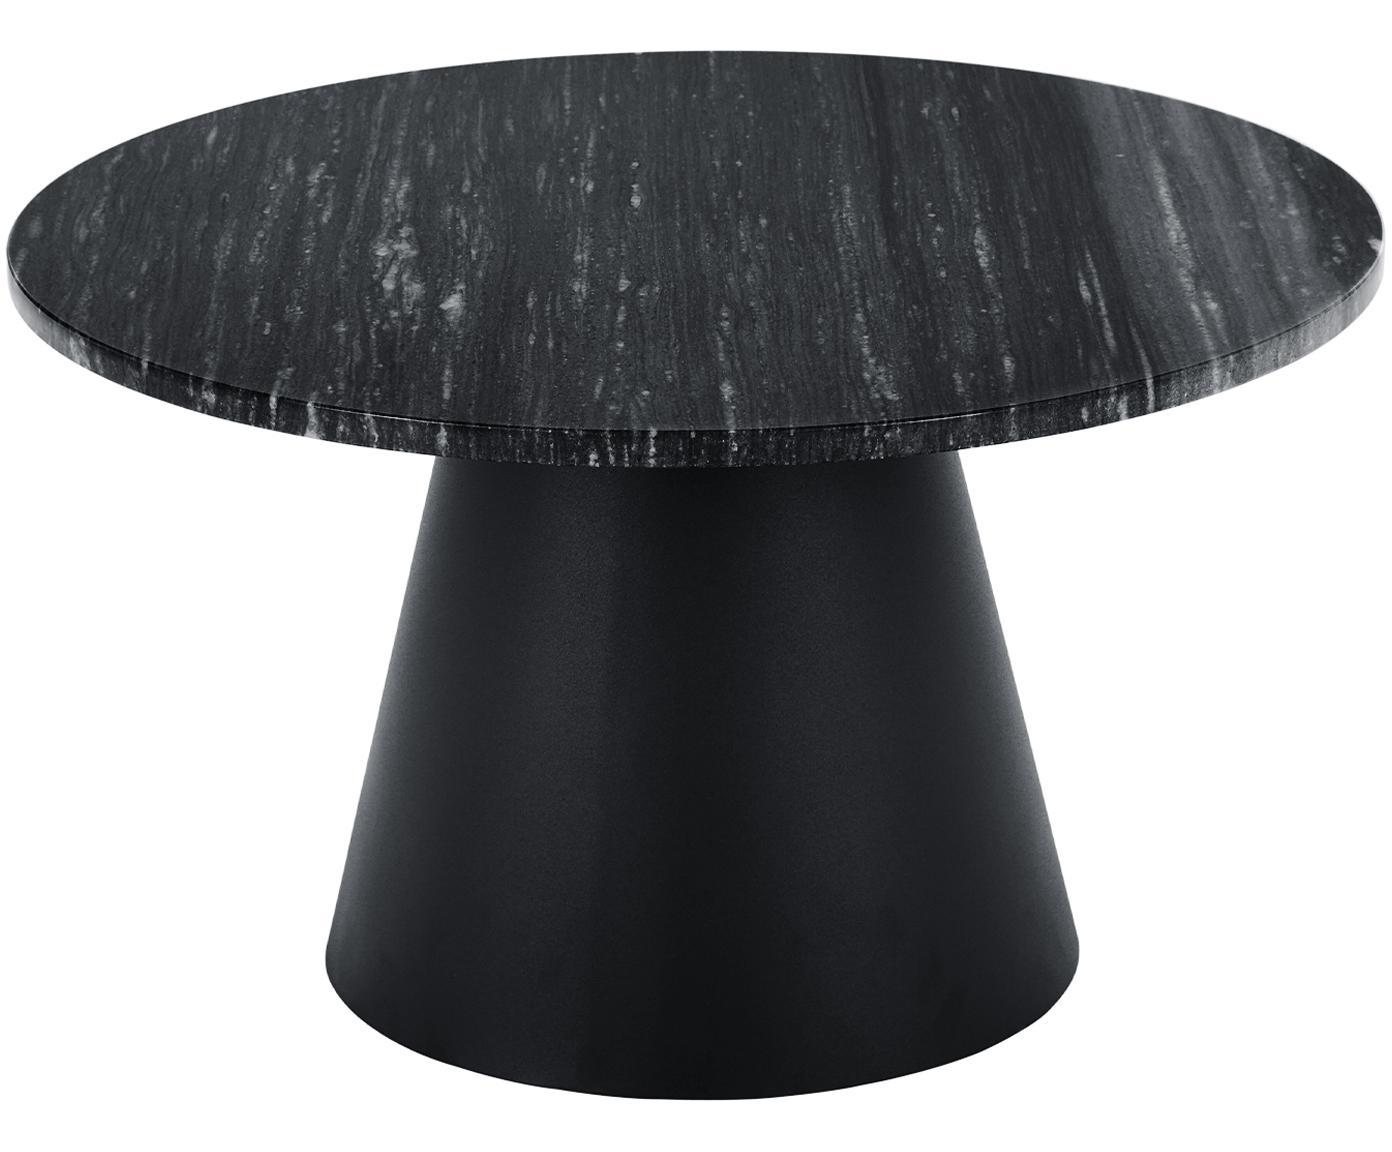 Ronde marmeren salontafel Mary, Tafelblad: marmer, Frame: gecoat metaal, Zwart marmer, zwart, Ø 70 x H 40 cm